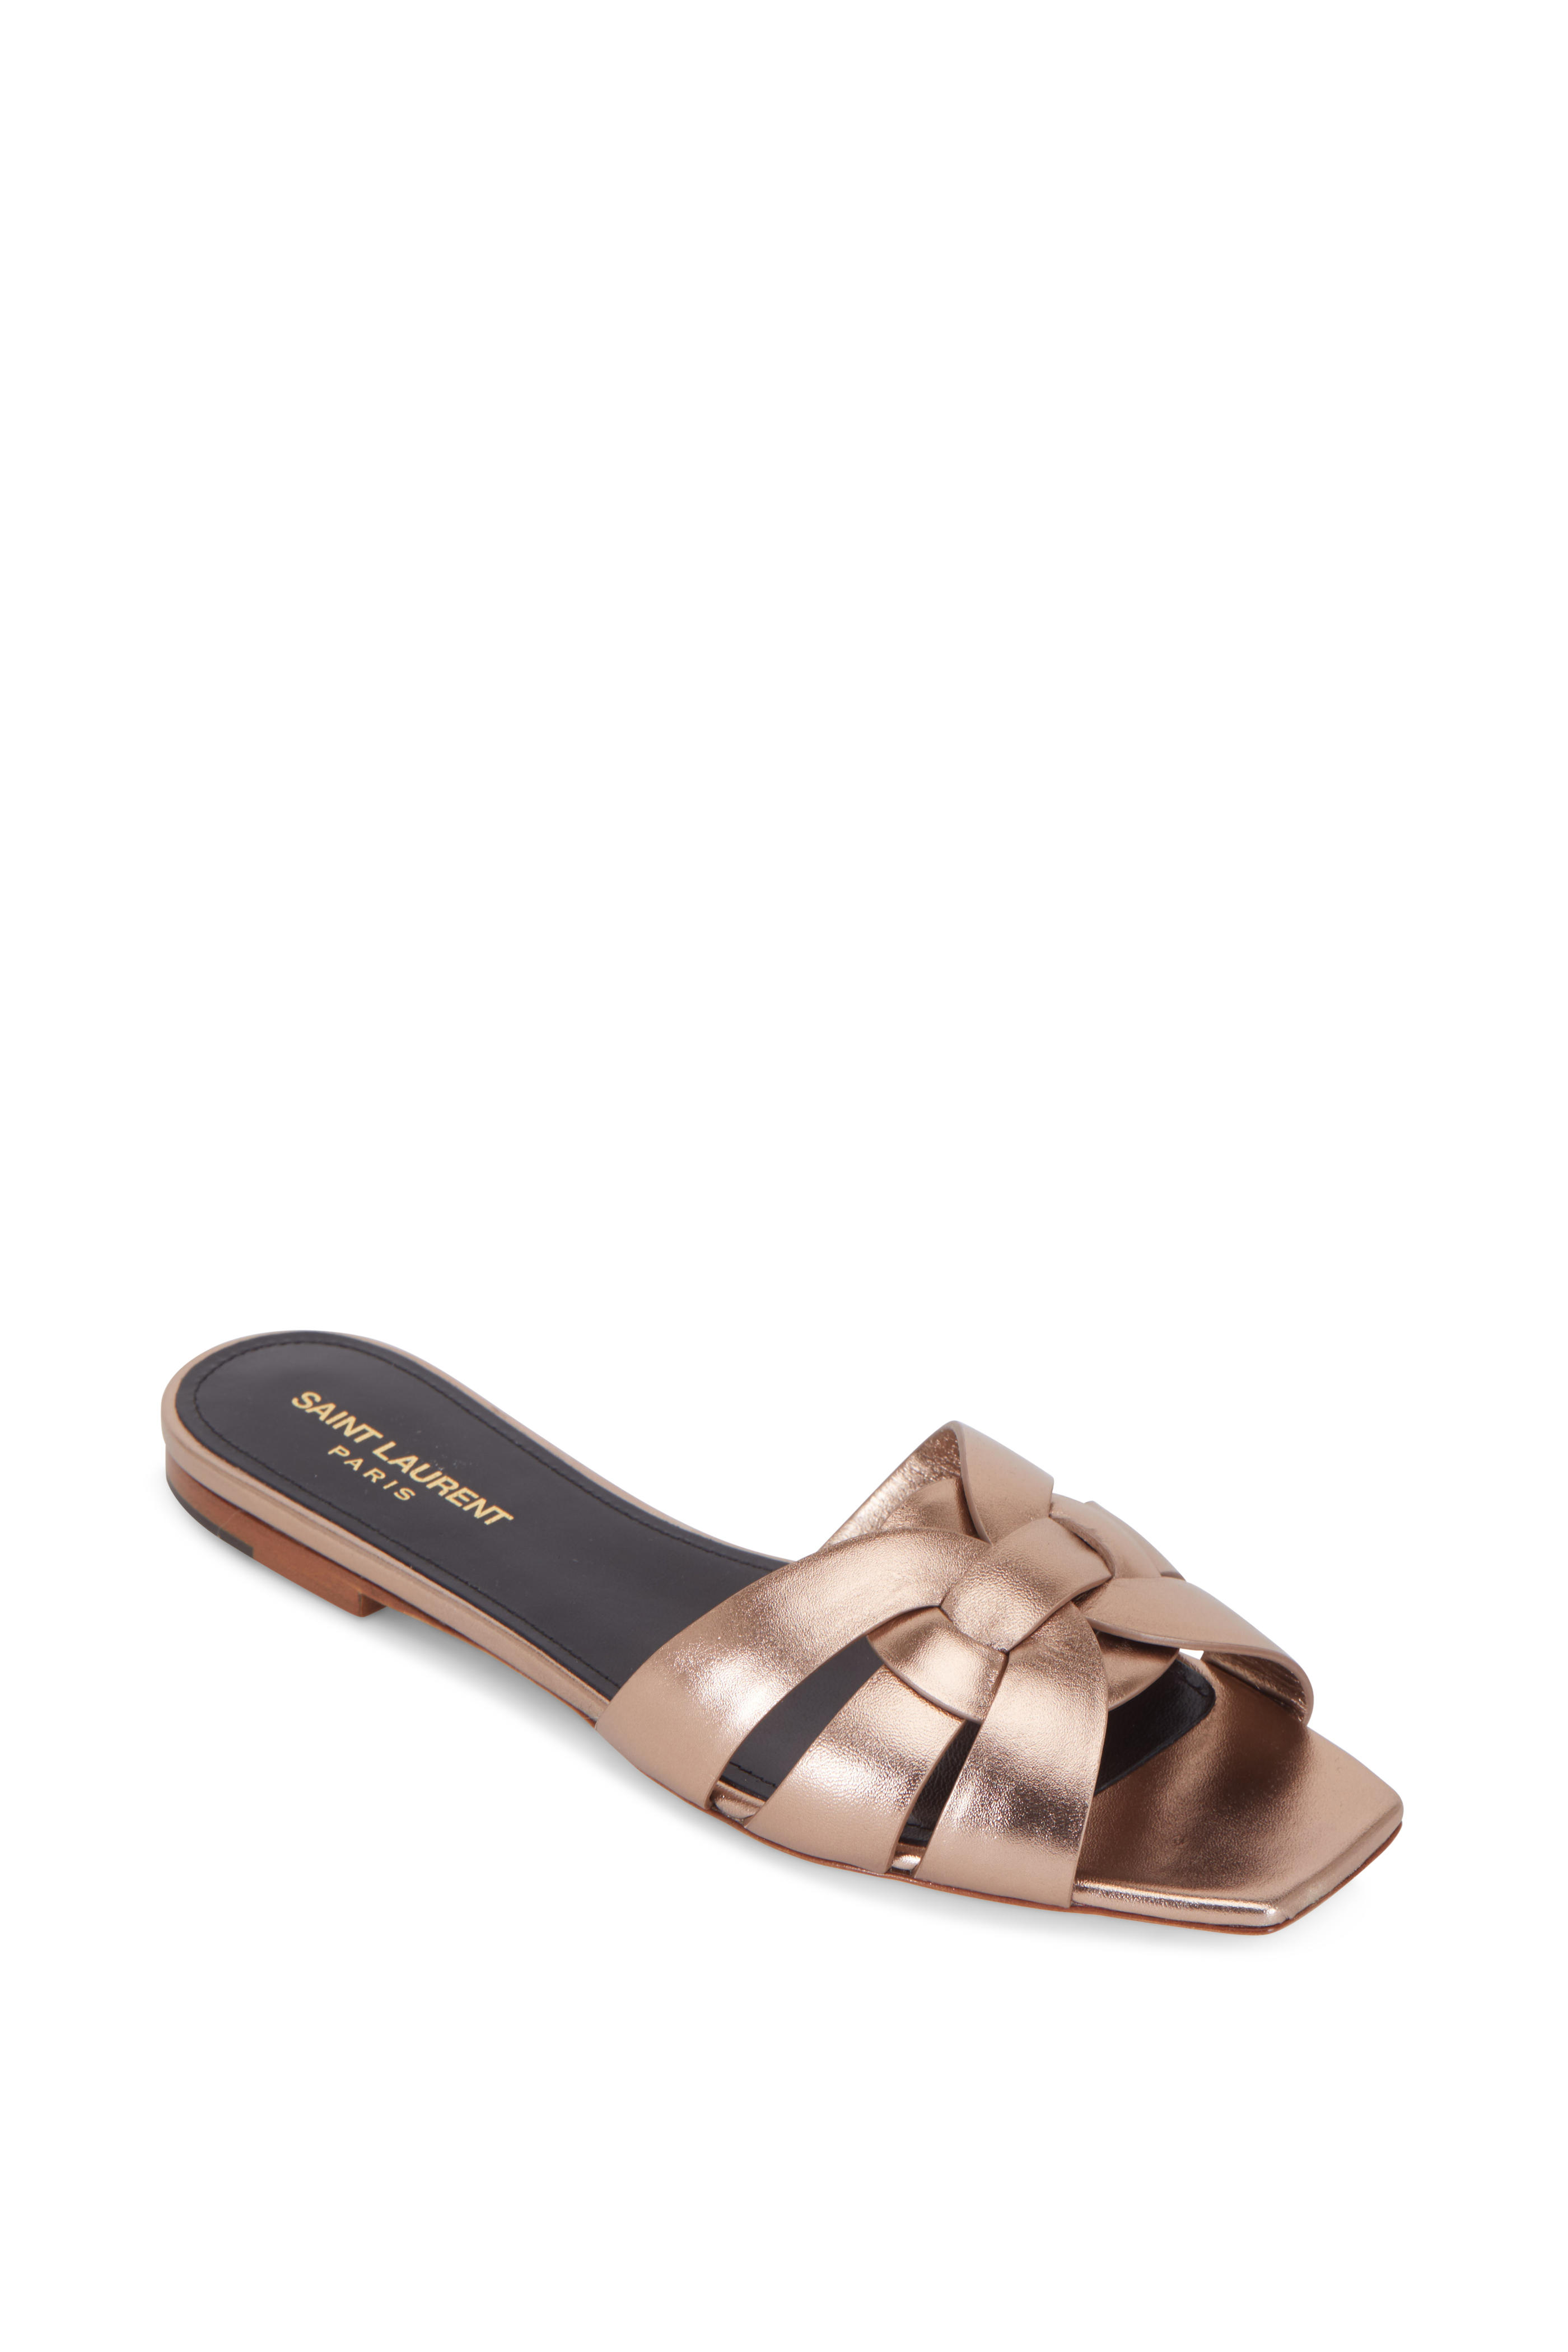 b964b706172 Saint Laurent - Nu Pieds Tribute Rosegold Metallic Flat Sandal ...